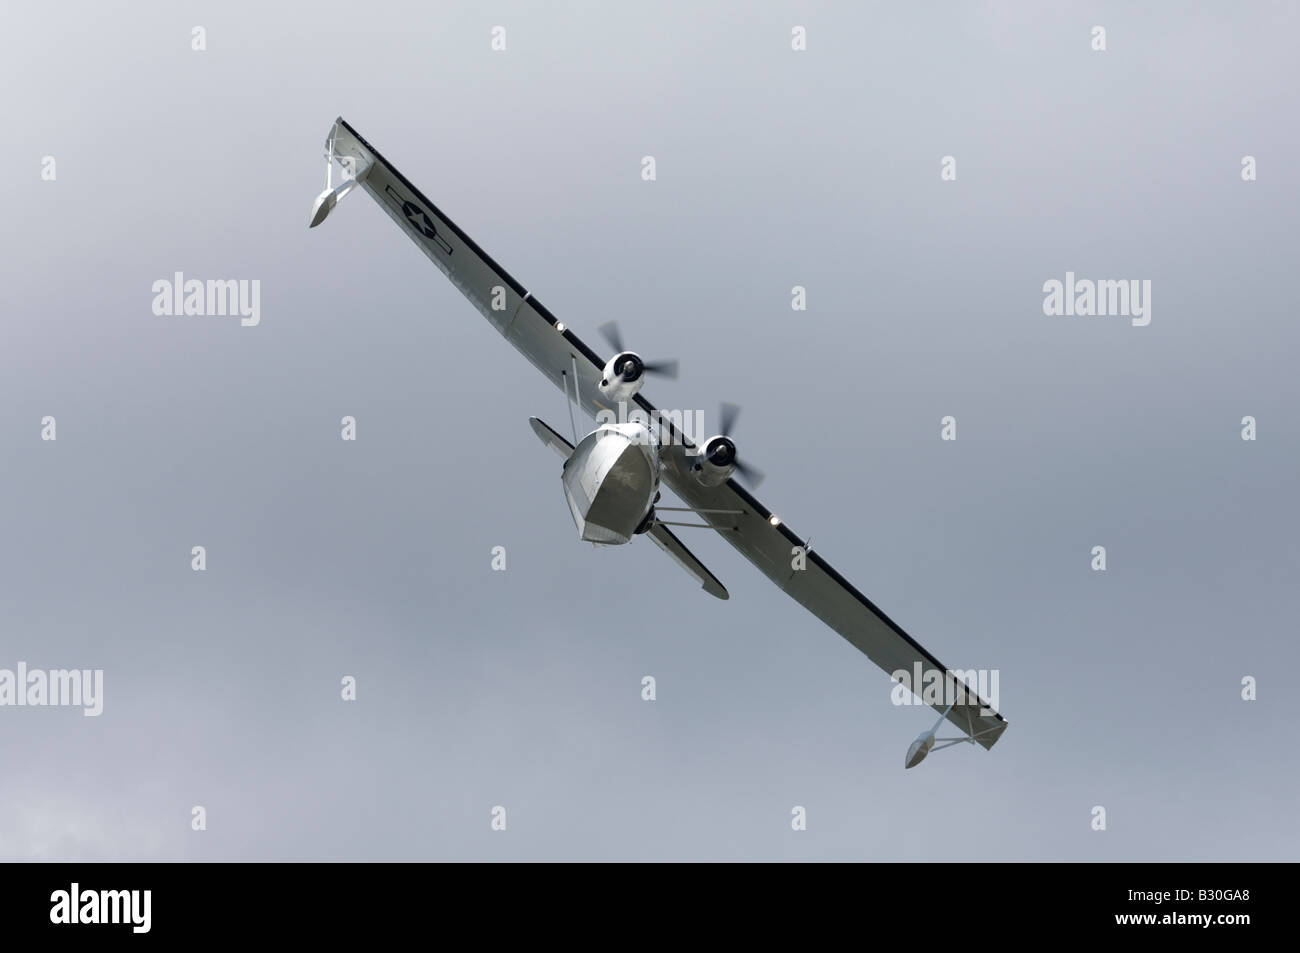 PBY Catalina seaplane - Stock Image